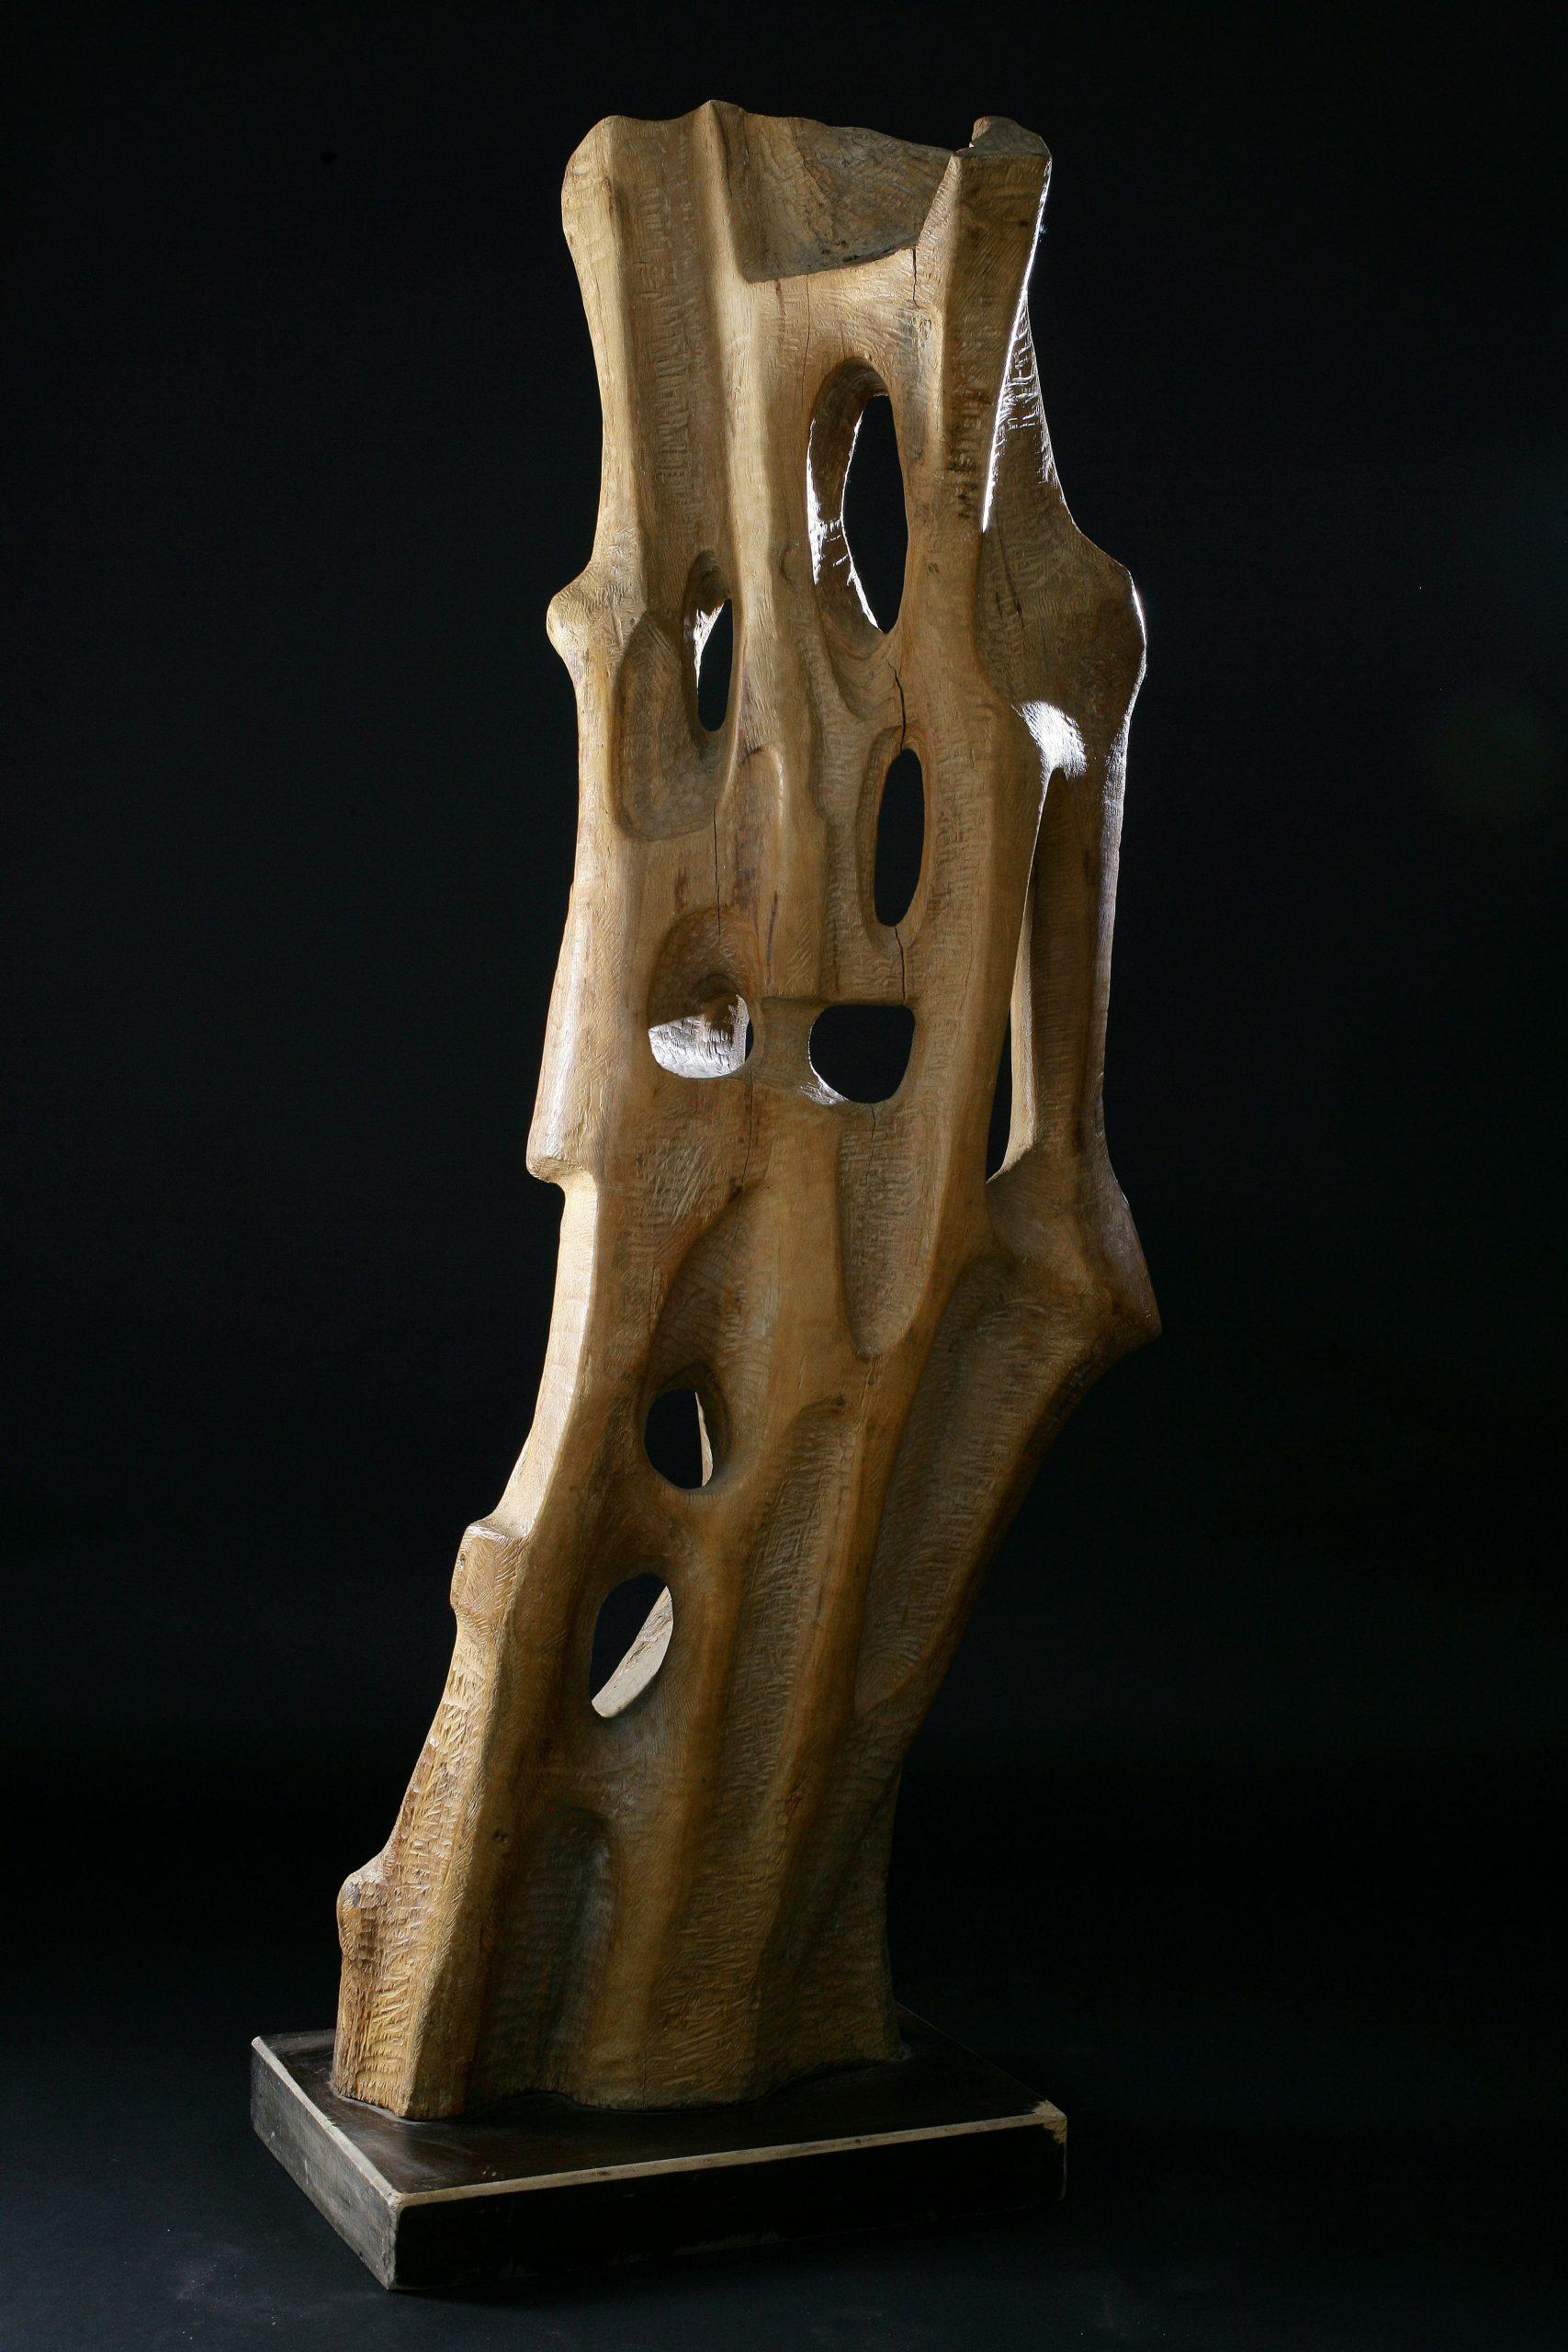 Figure 1967, olive wood sculpture, 156x50x53cm, di Adolf Vallazza